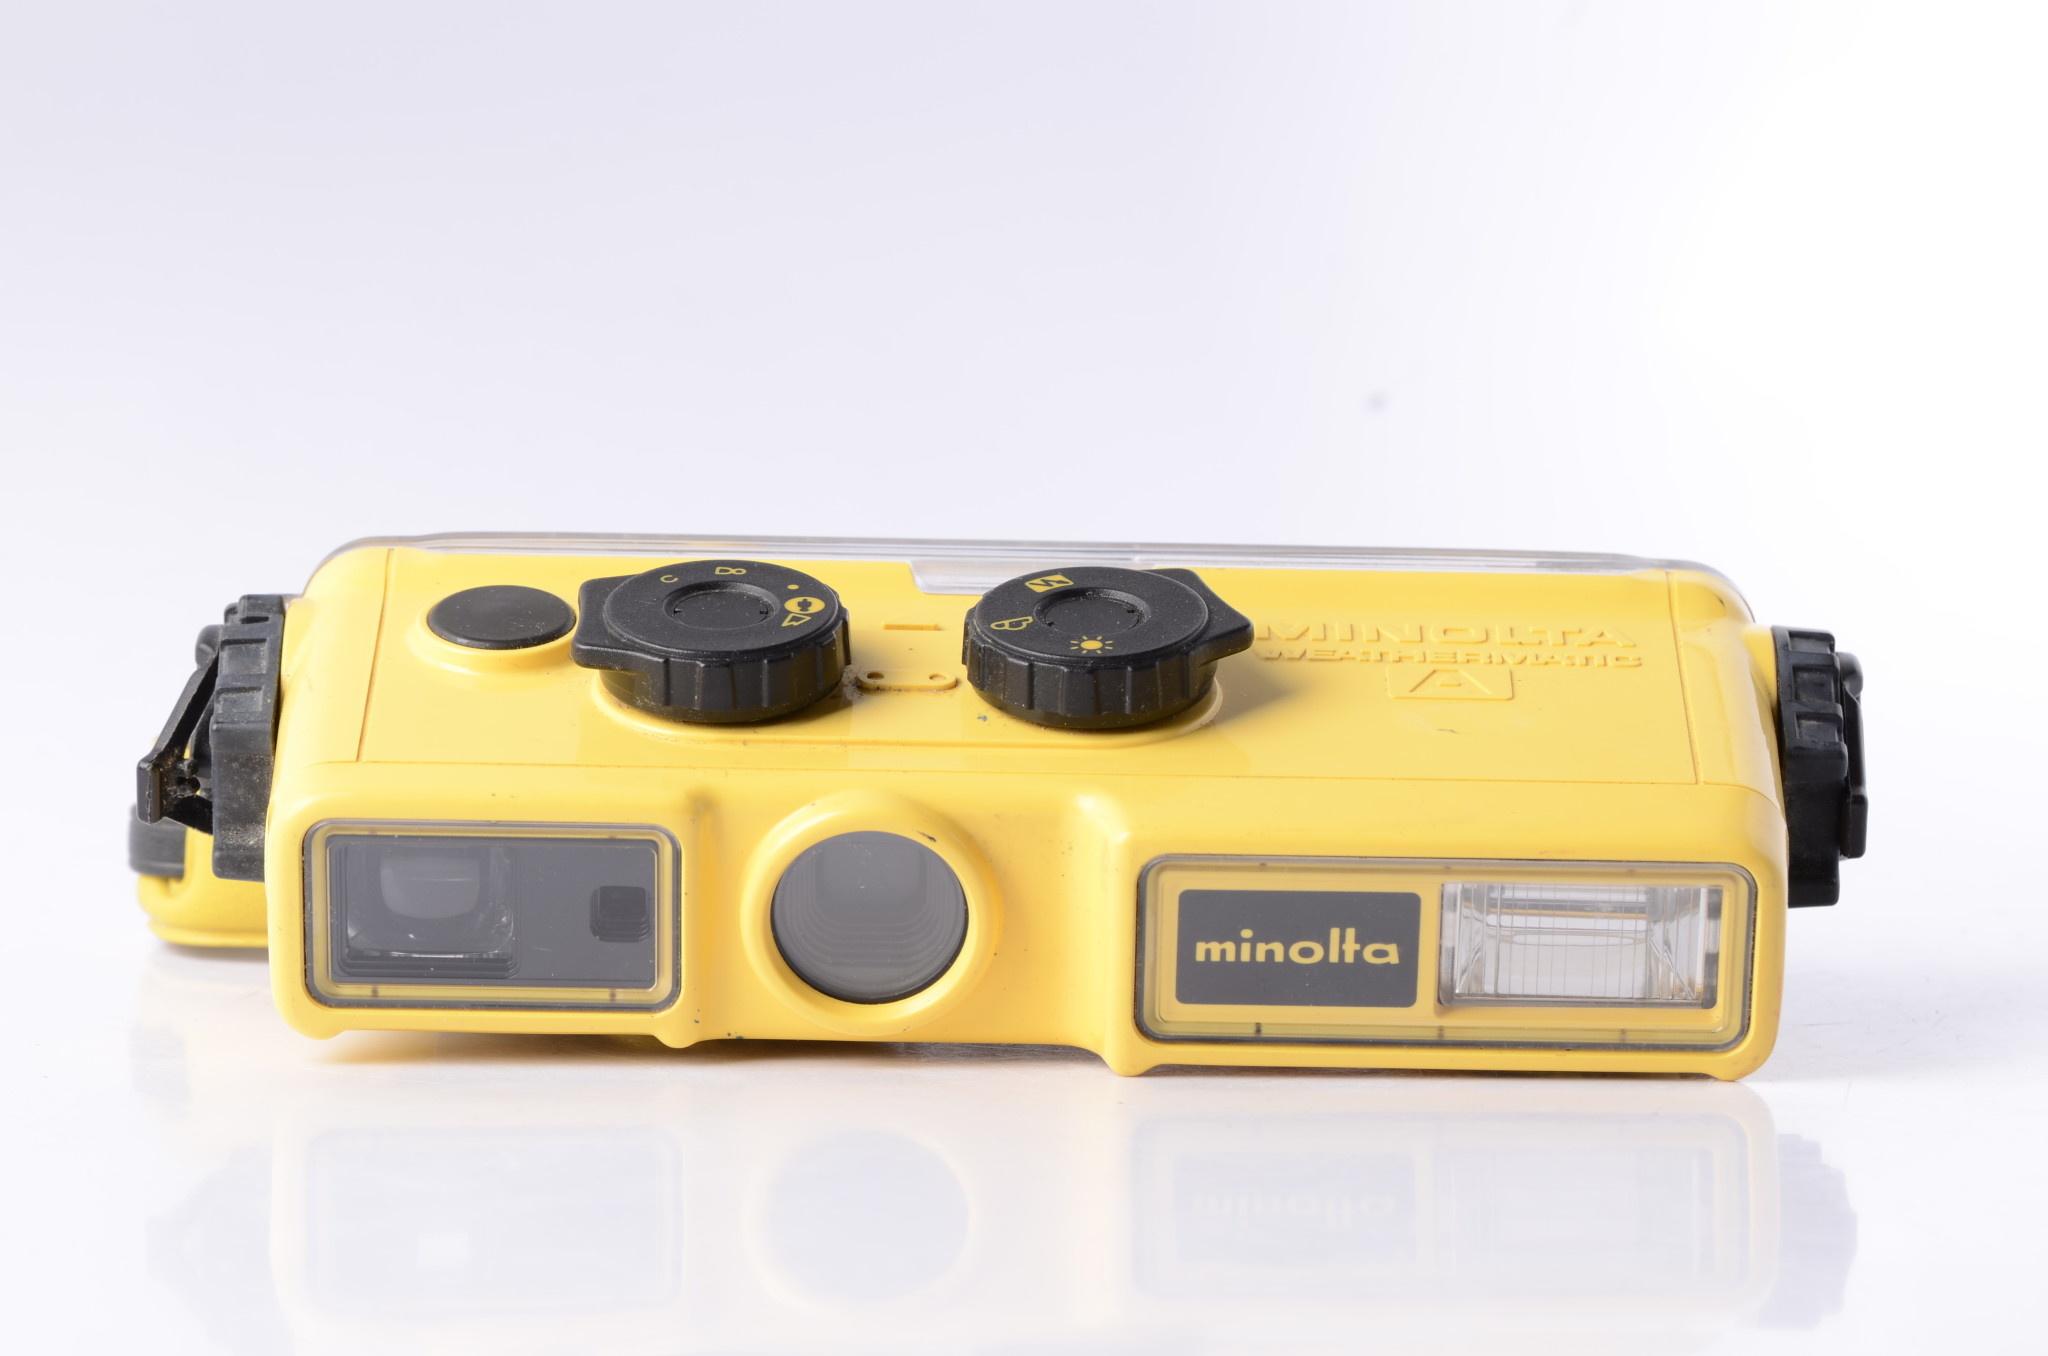 Minolta Minolta Weathermatic A 110 Camera SN: 1025586